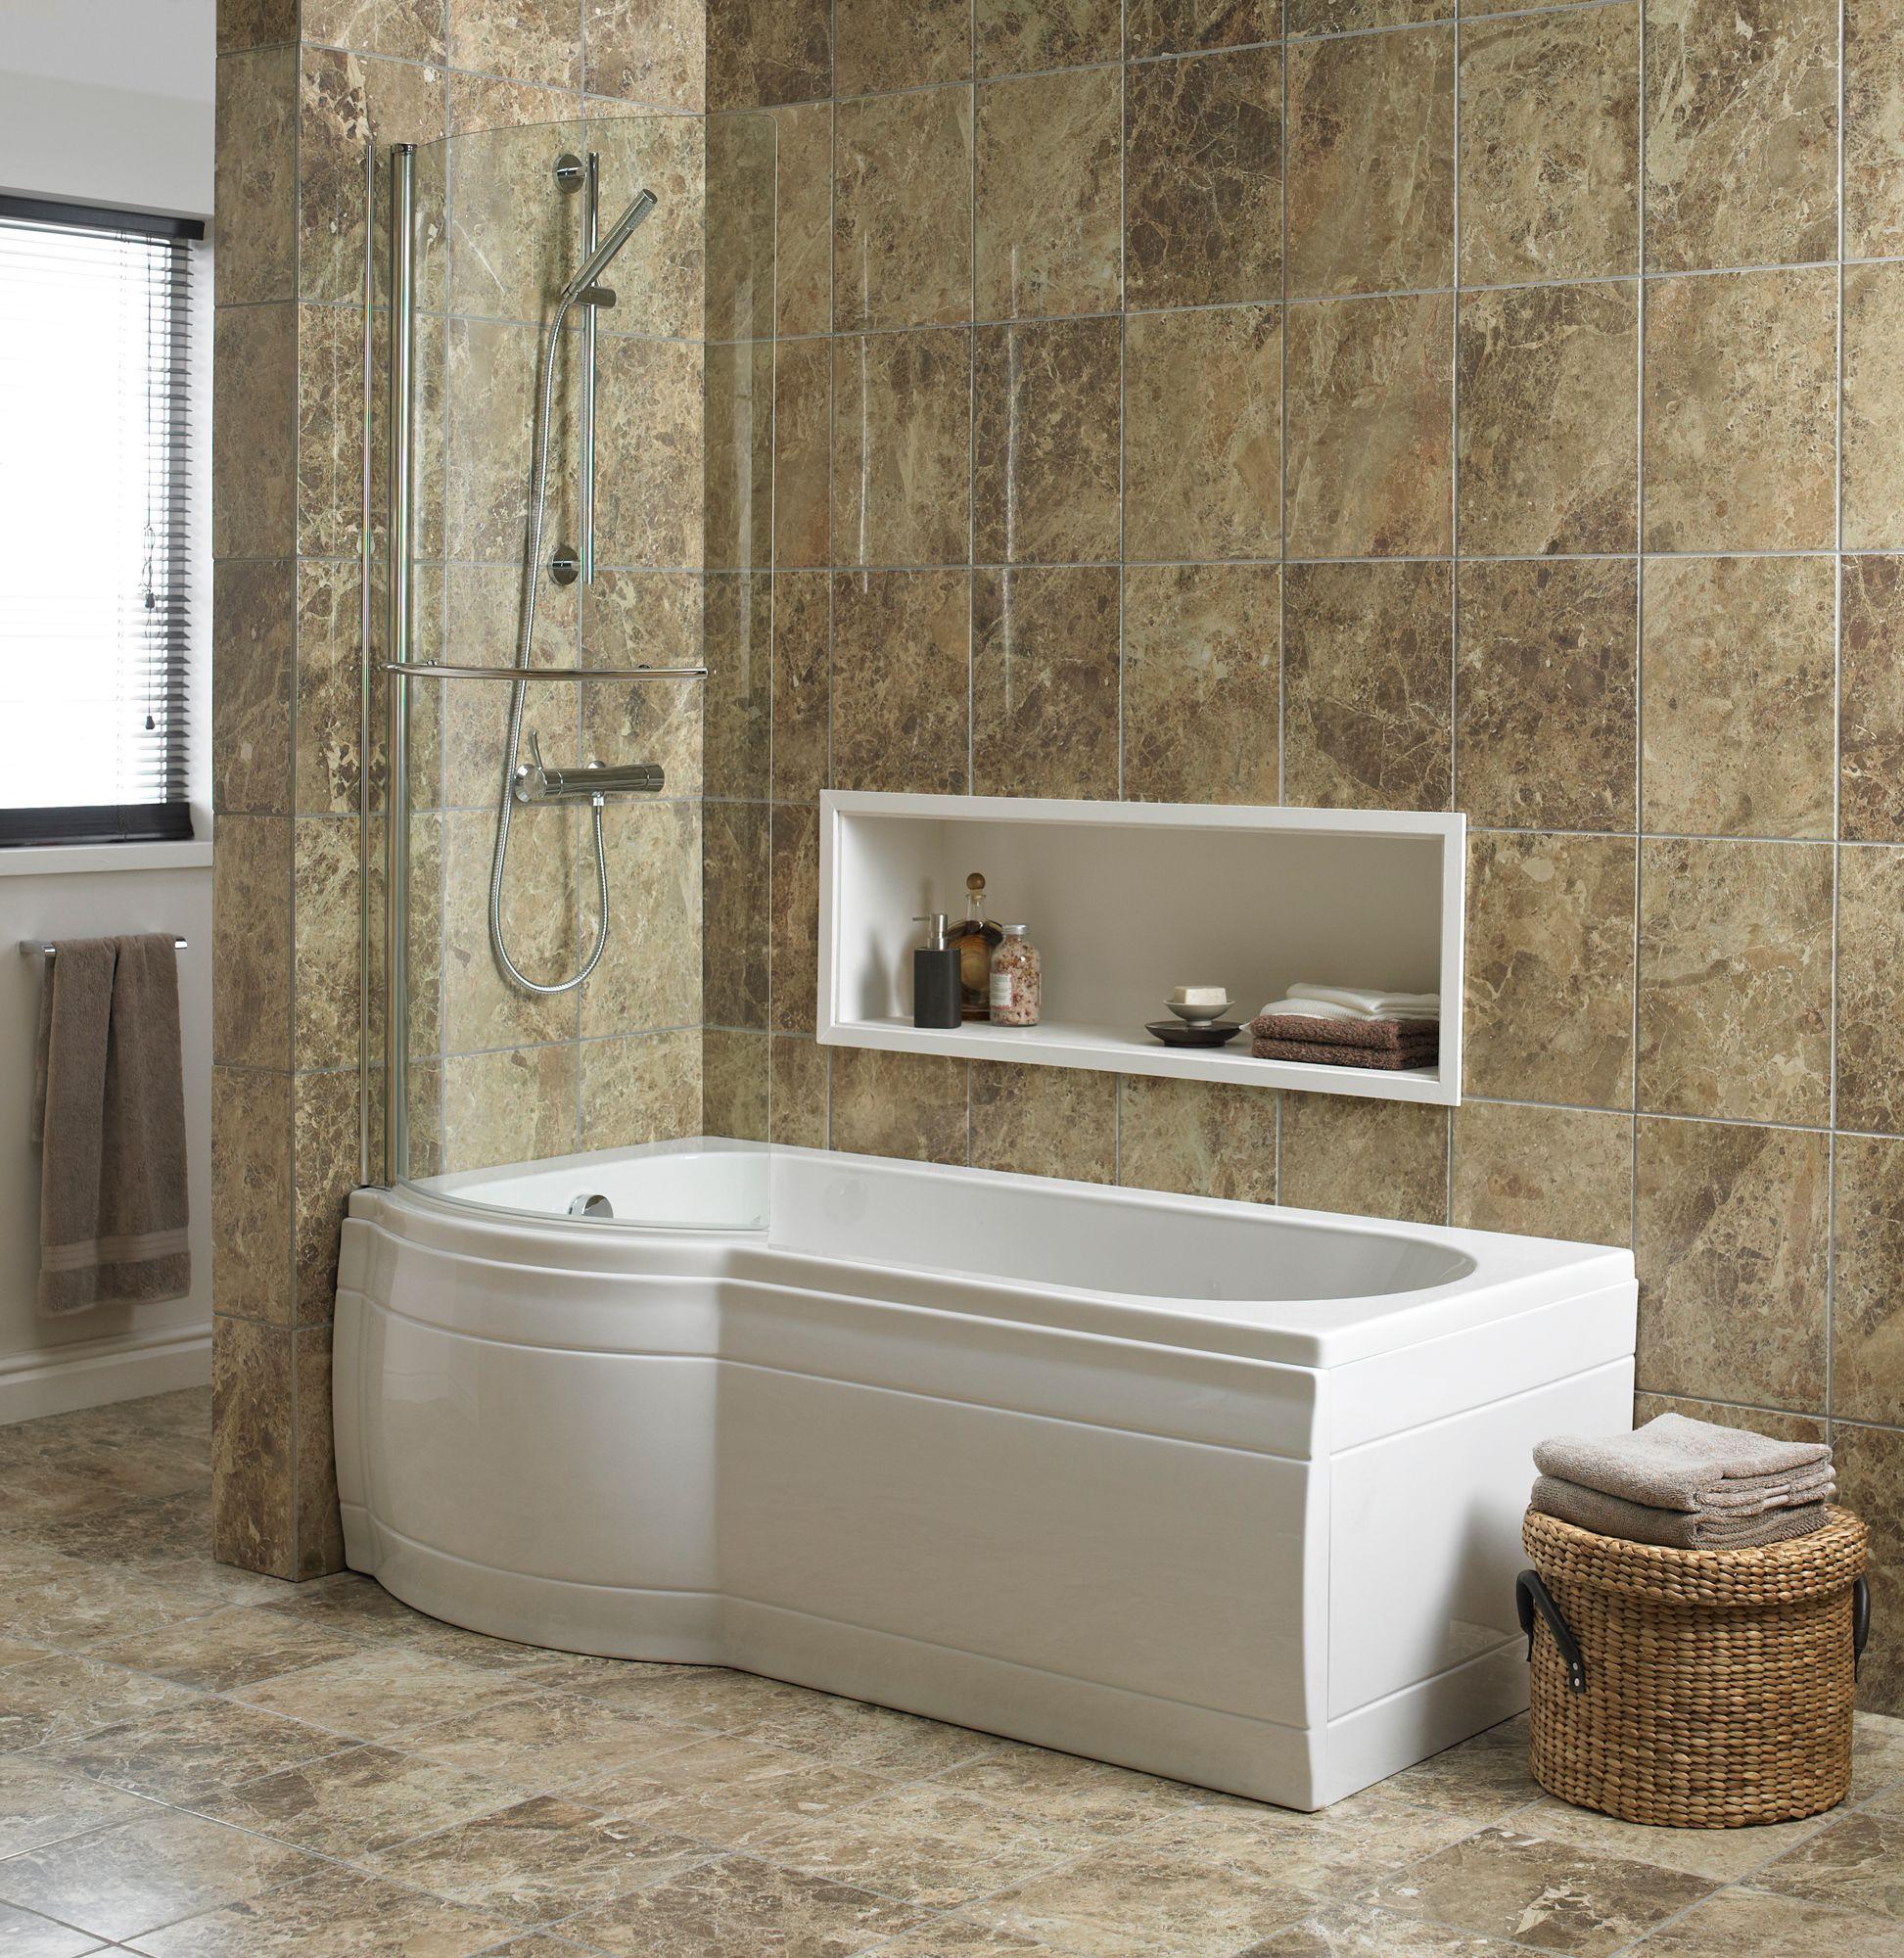 B And Q Bathroom Tiles : Bathroom tile b q brightpulse